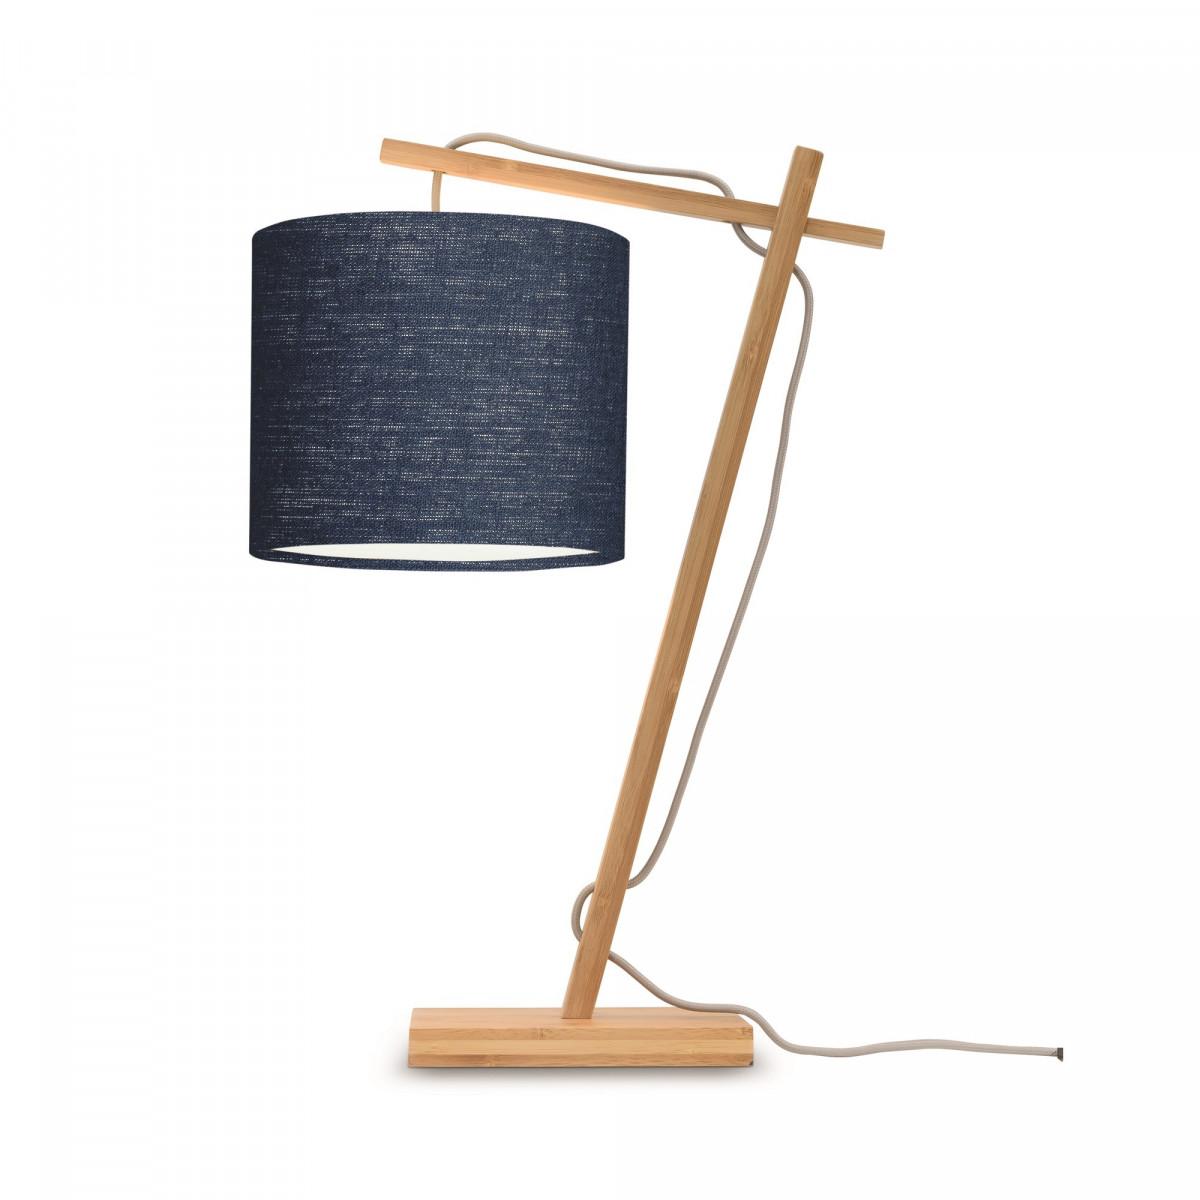 Lampe de table Andes en bambou naturel et lin Bleu denim